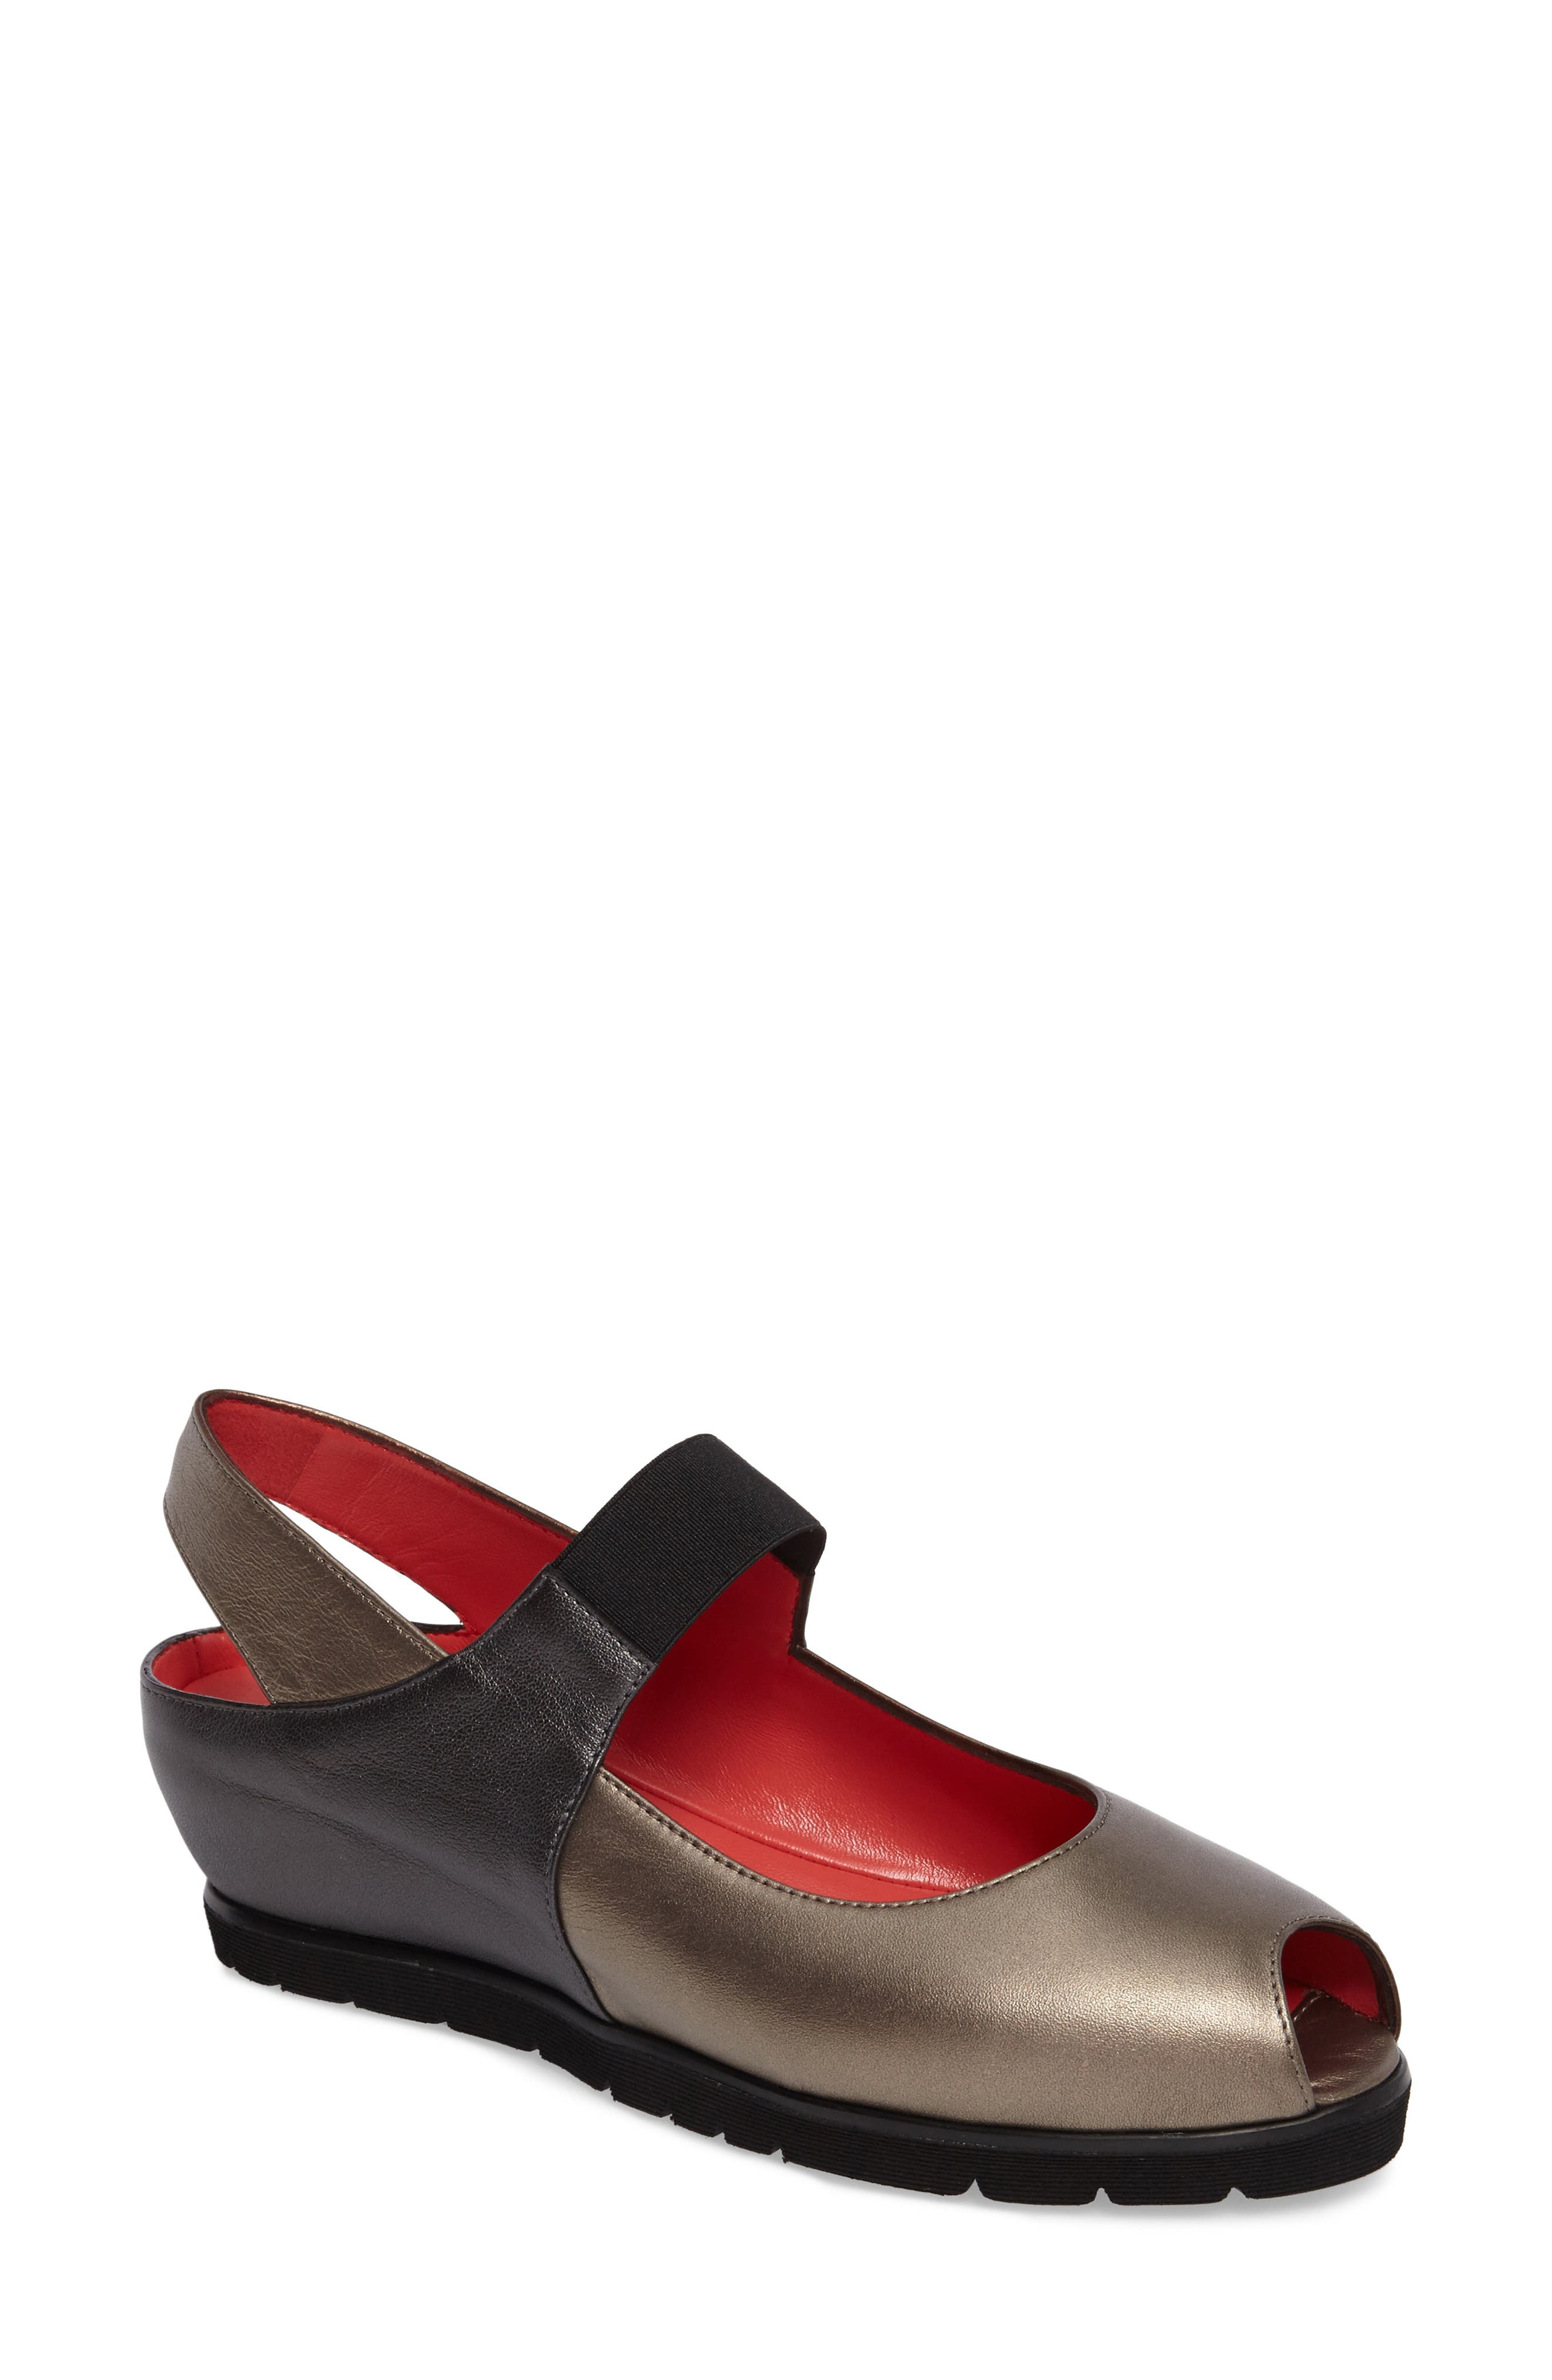 Alternate Image 1 Selected - Pas de Rouge Slingback Peep Toe Wedge (Women)